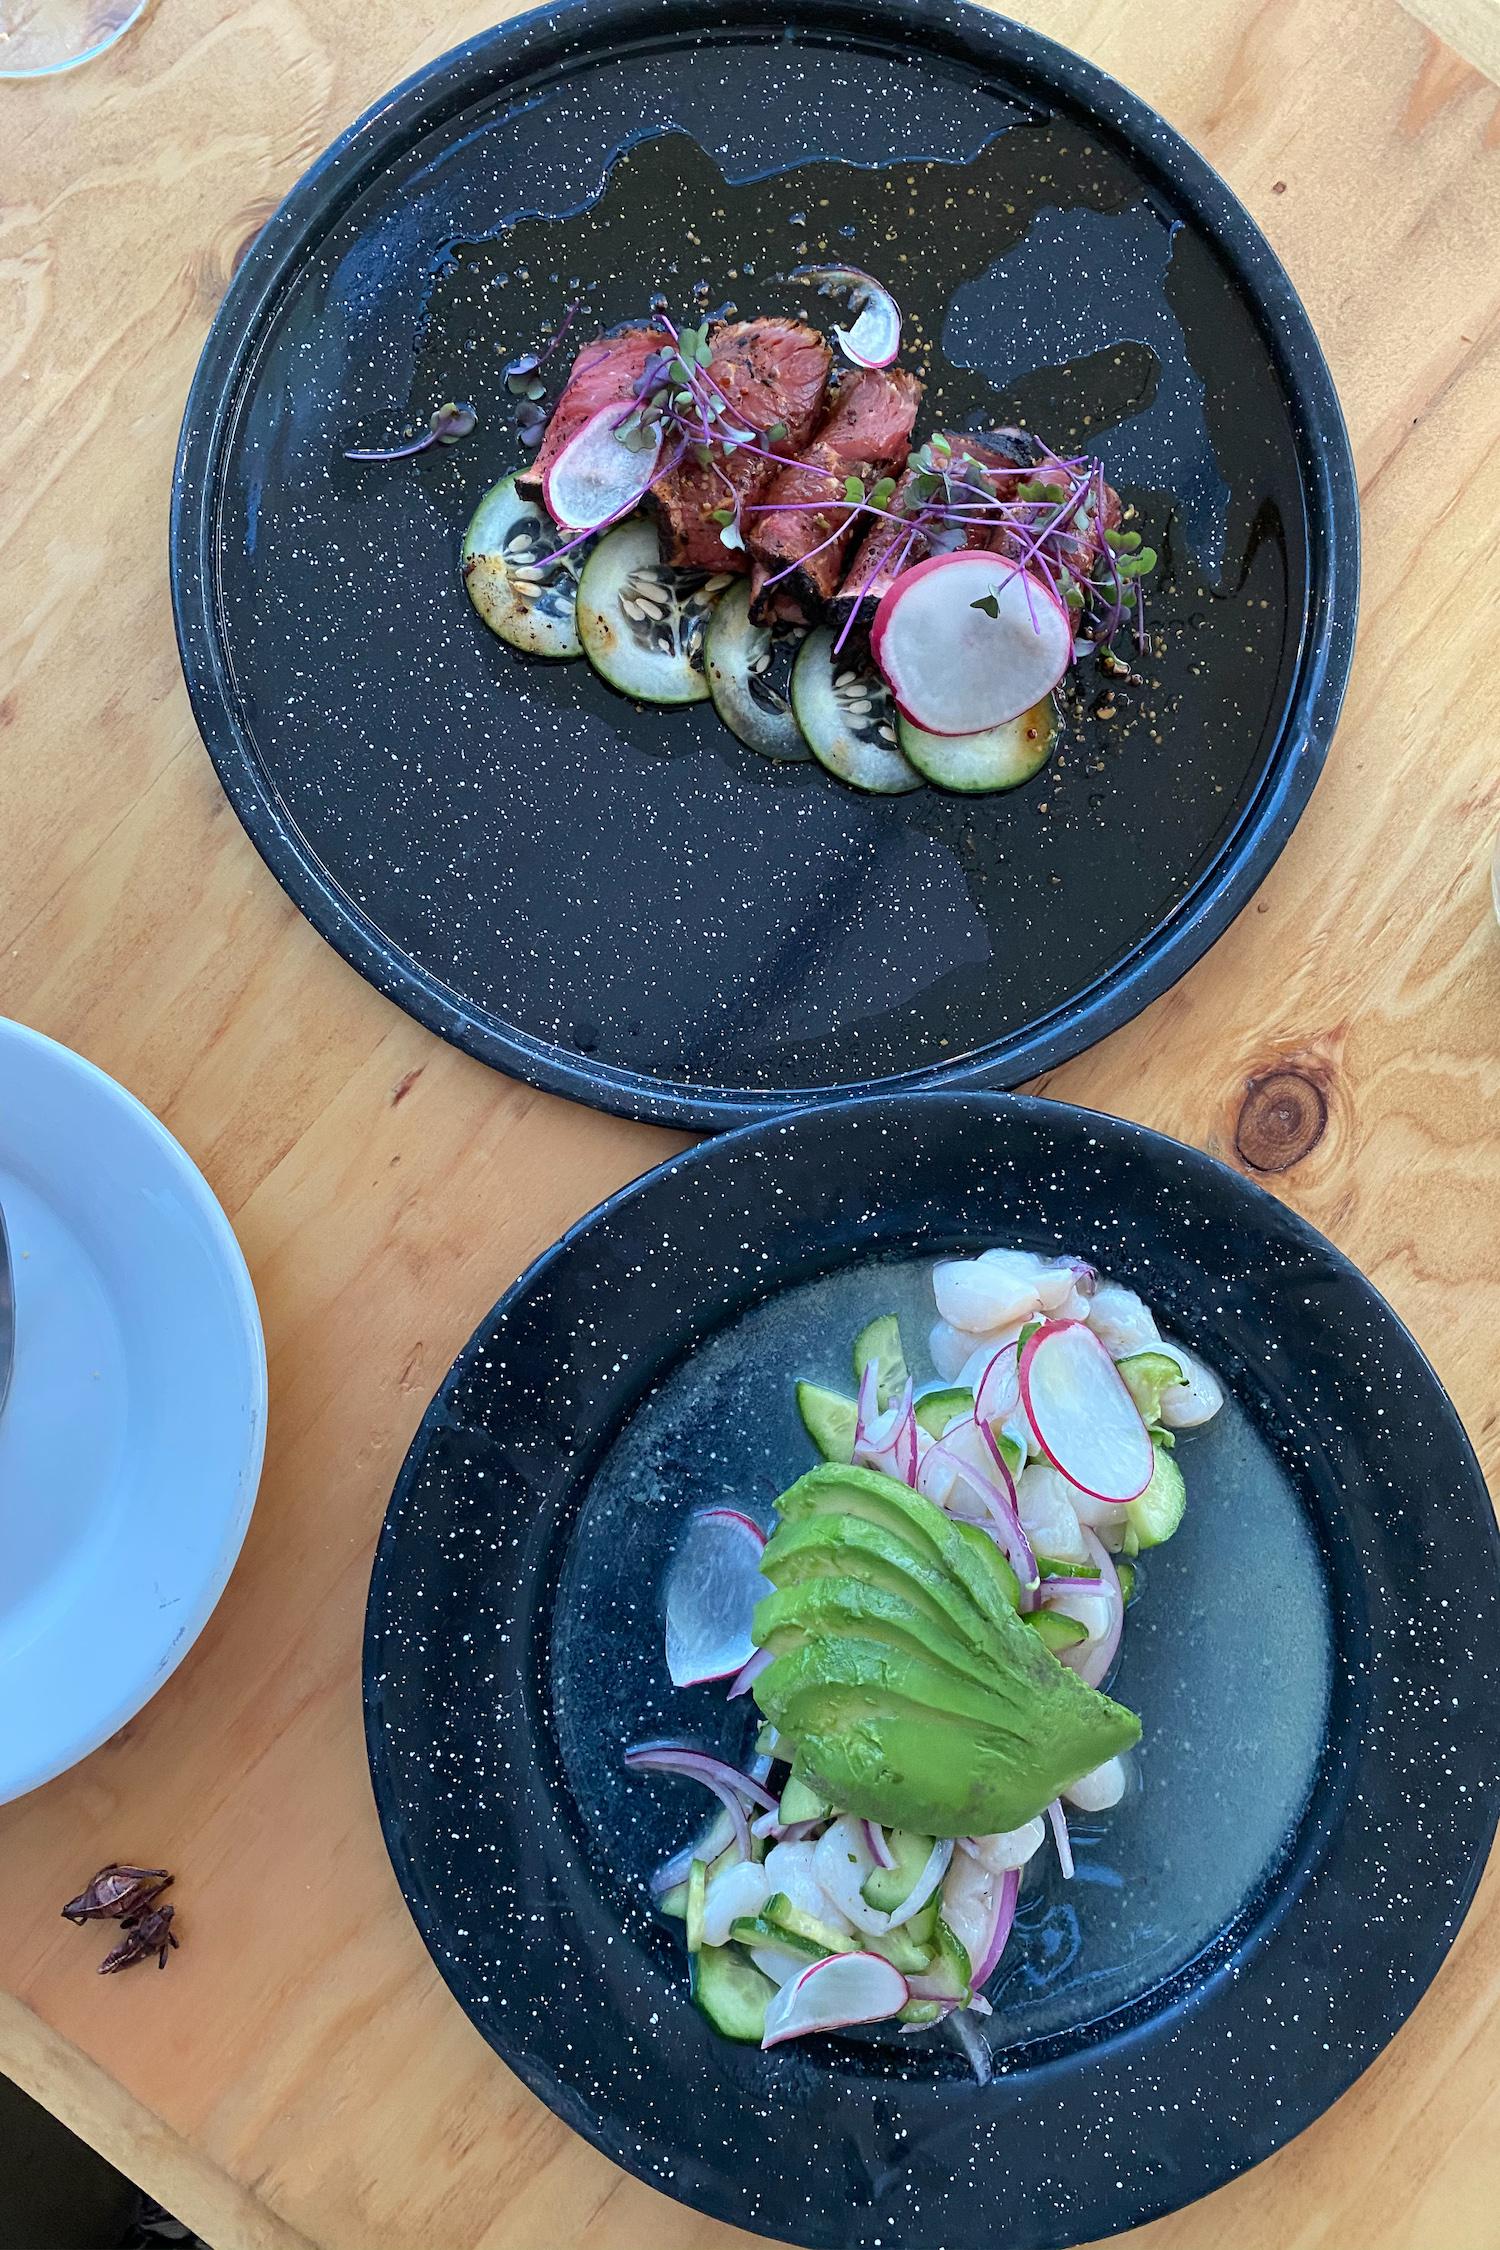 What to eat at Cuatro Cuatros in Valle de Guadalupe